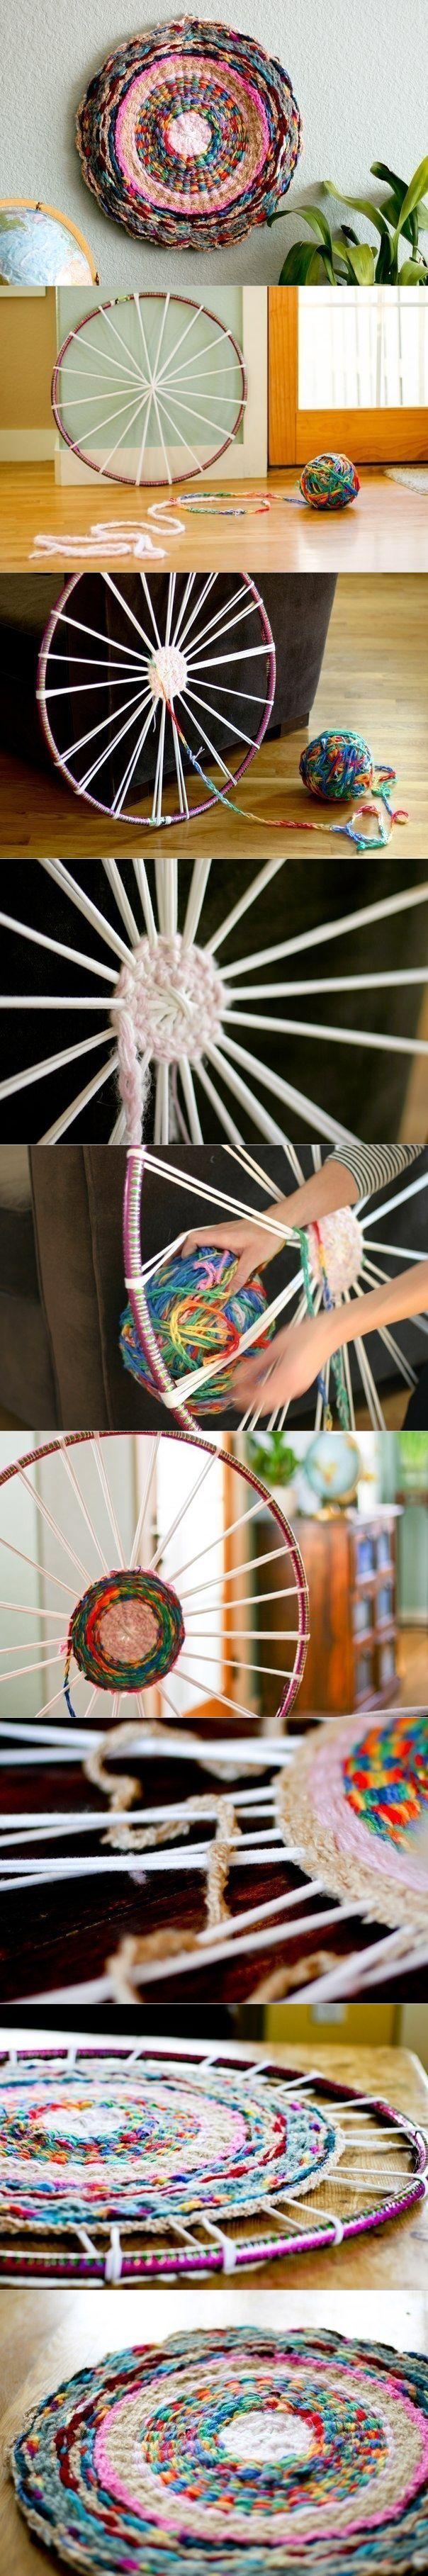 wheel wall decor from hula loop